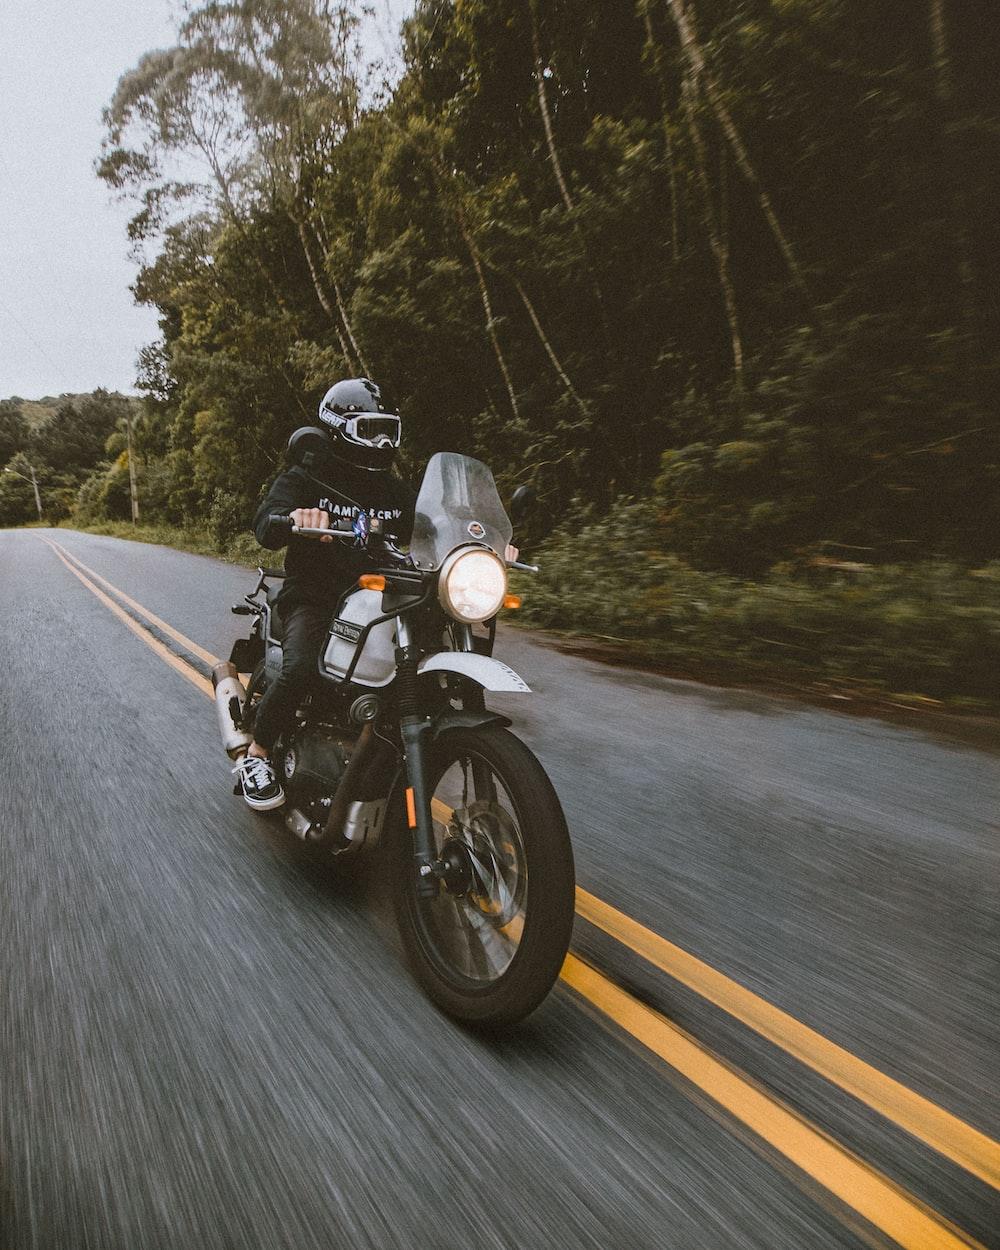 man in black helmet riding motorcycle on road during daytime